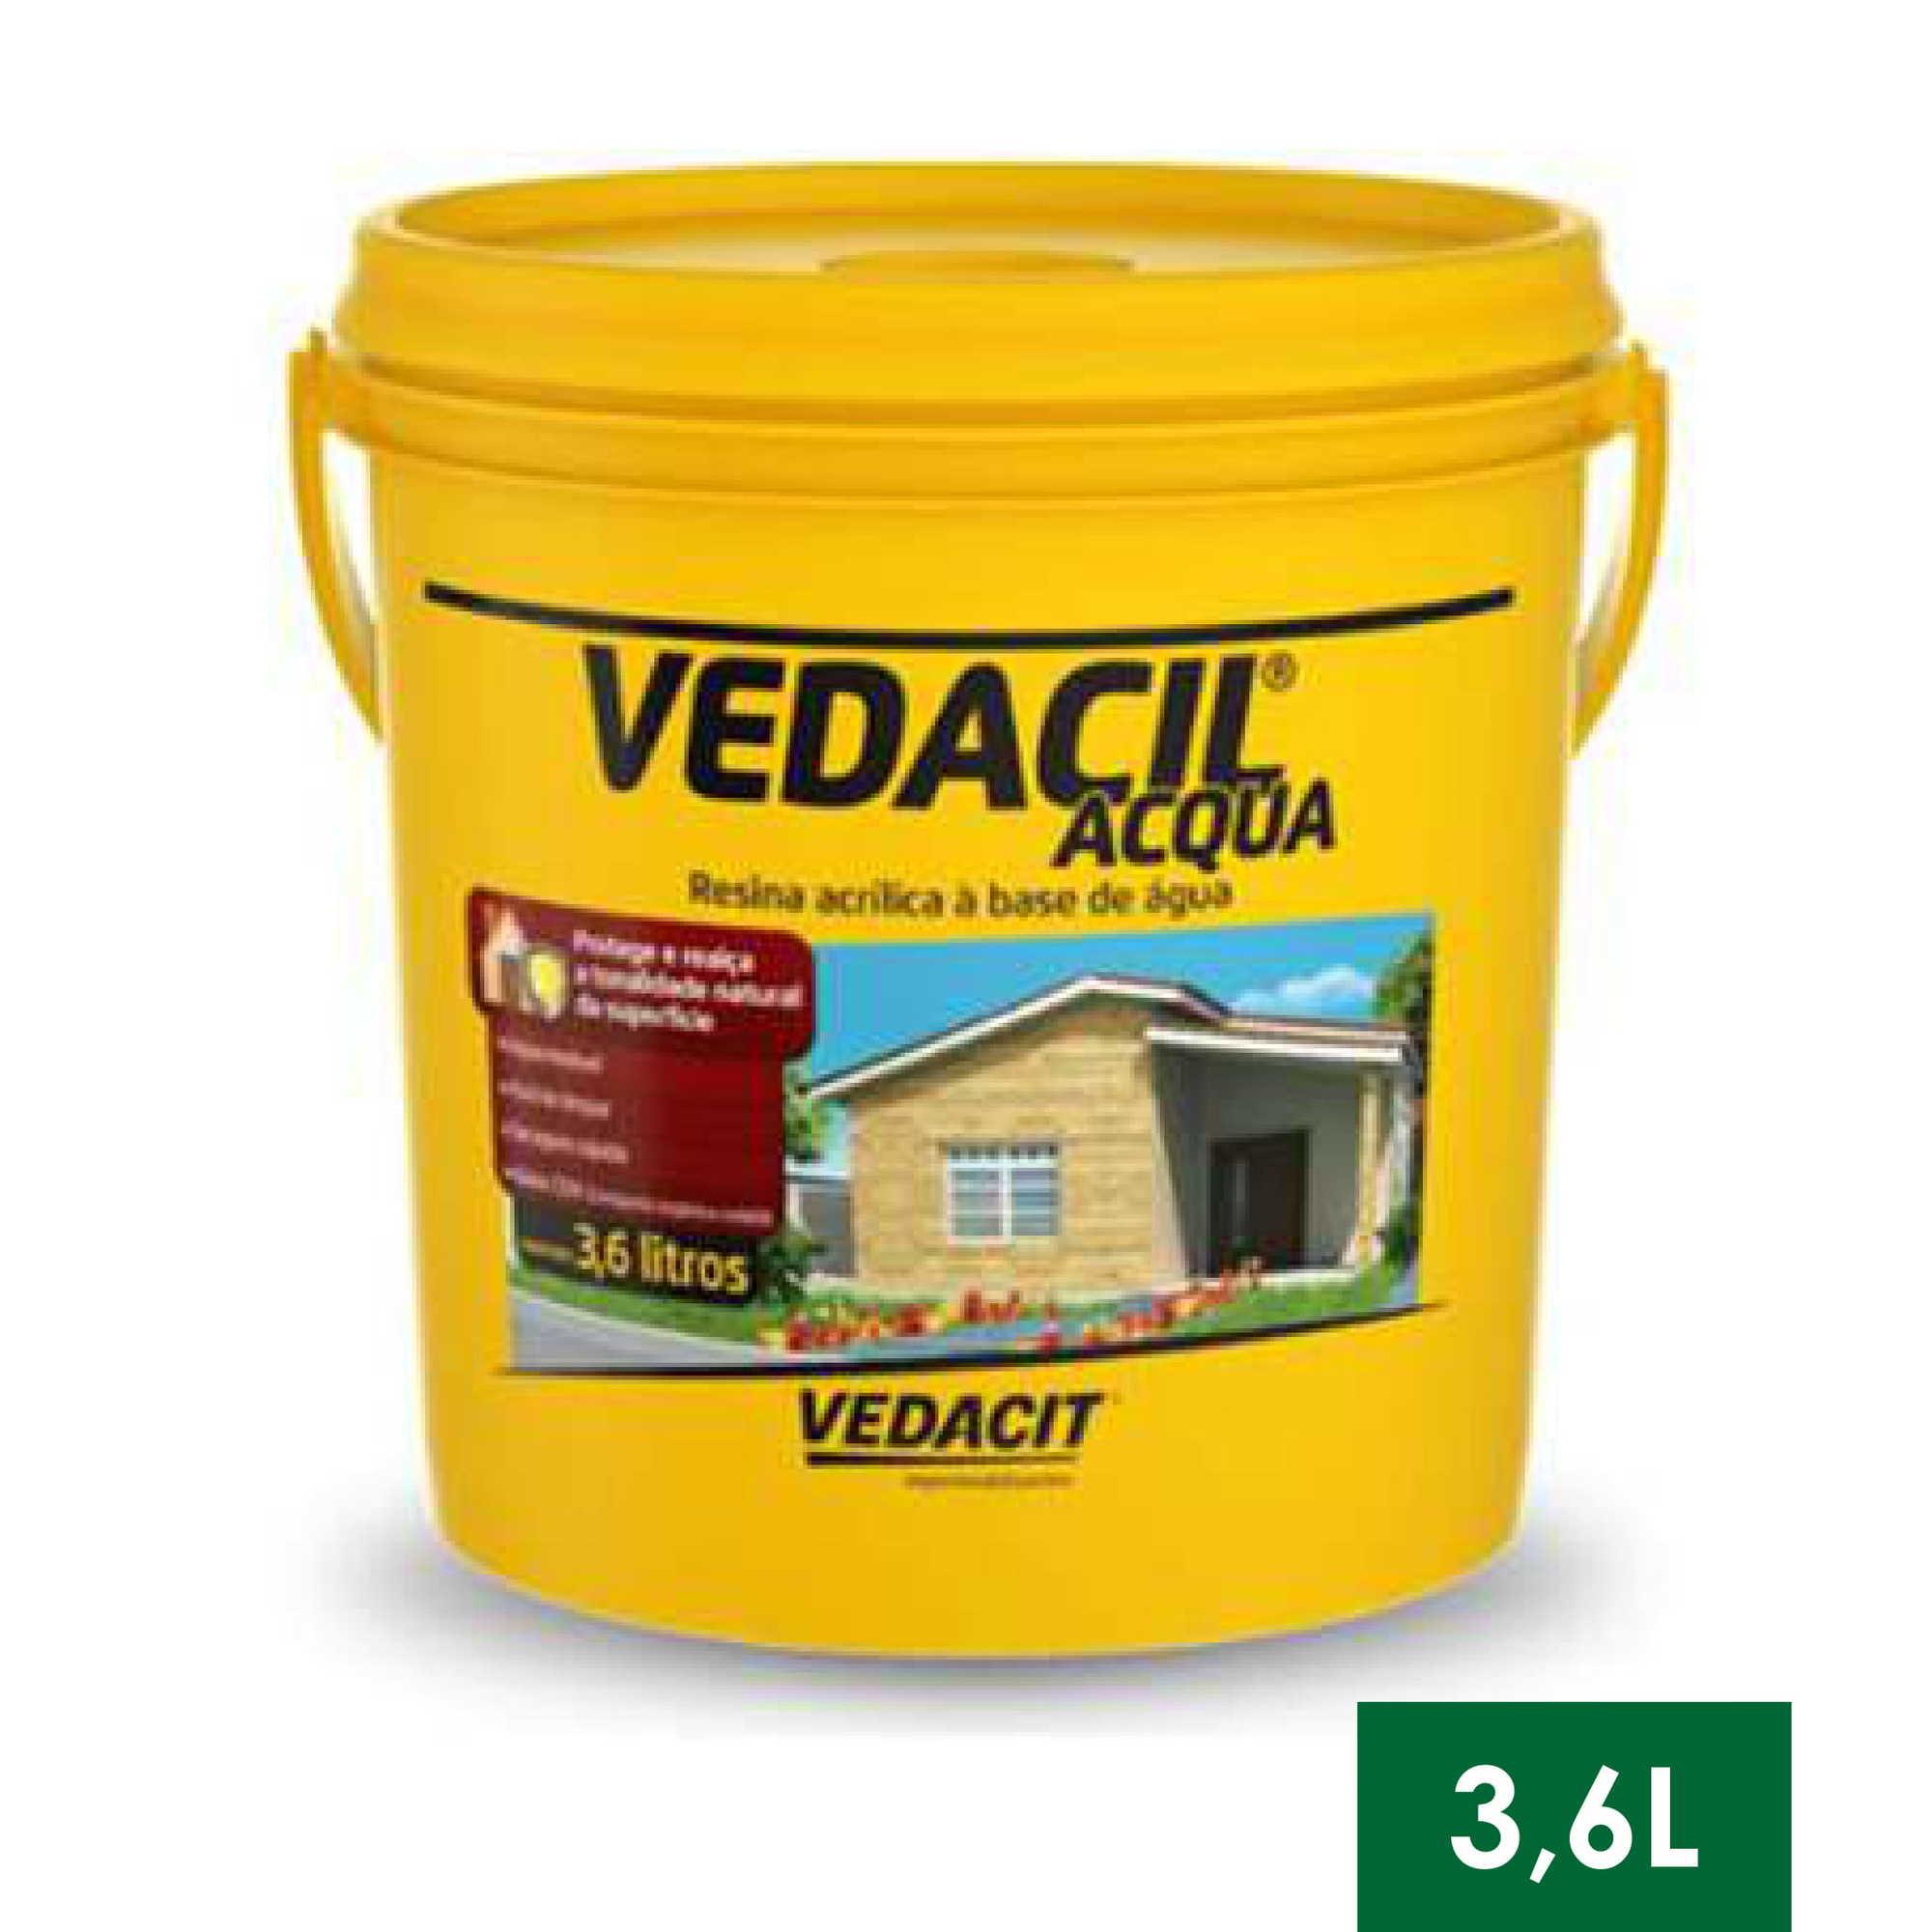 VEDACIL ACQUA 3,6 L